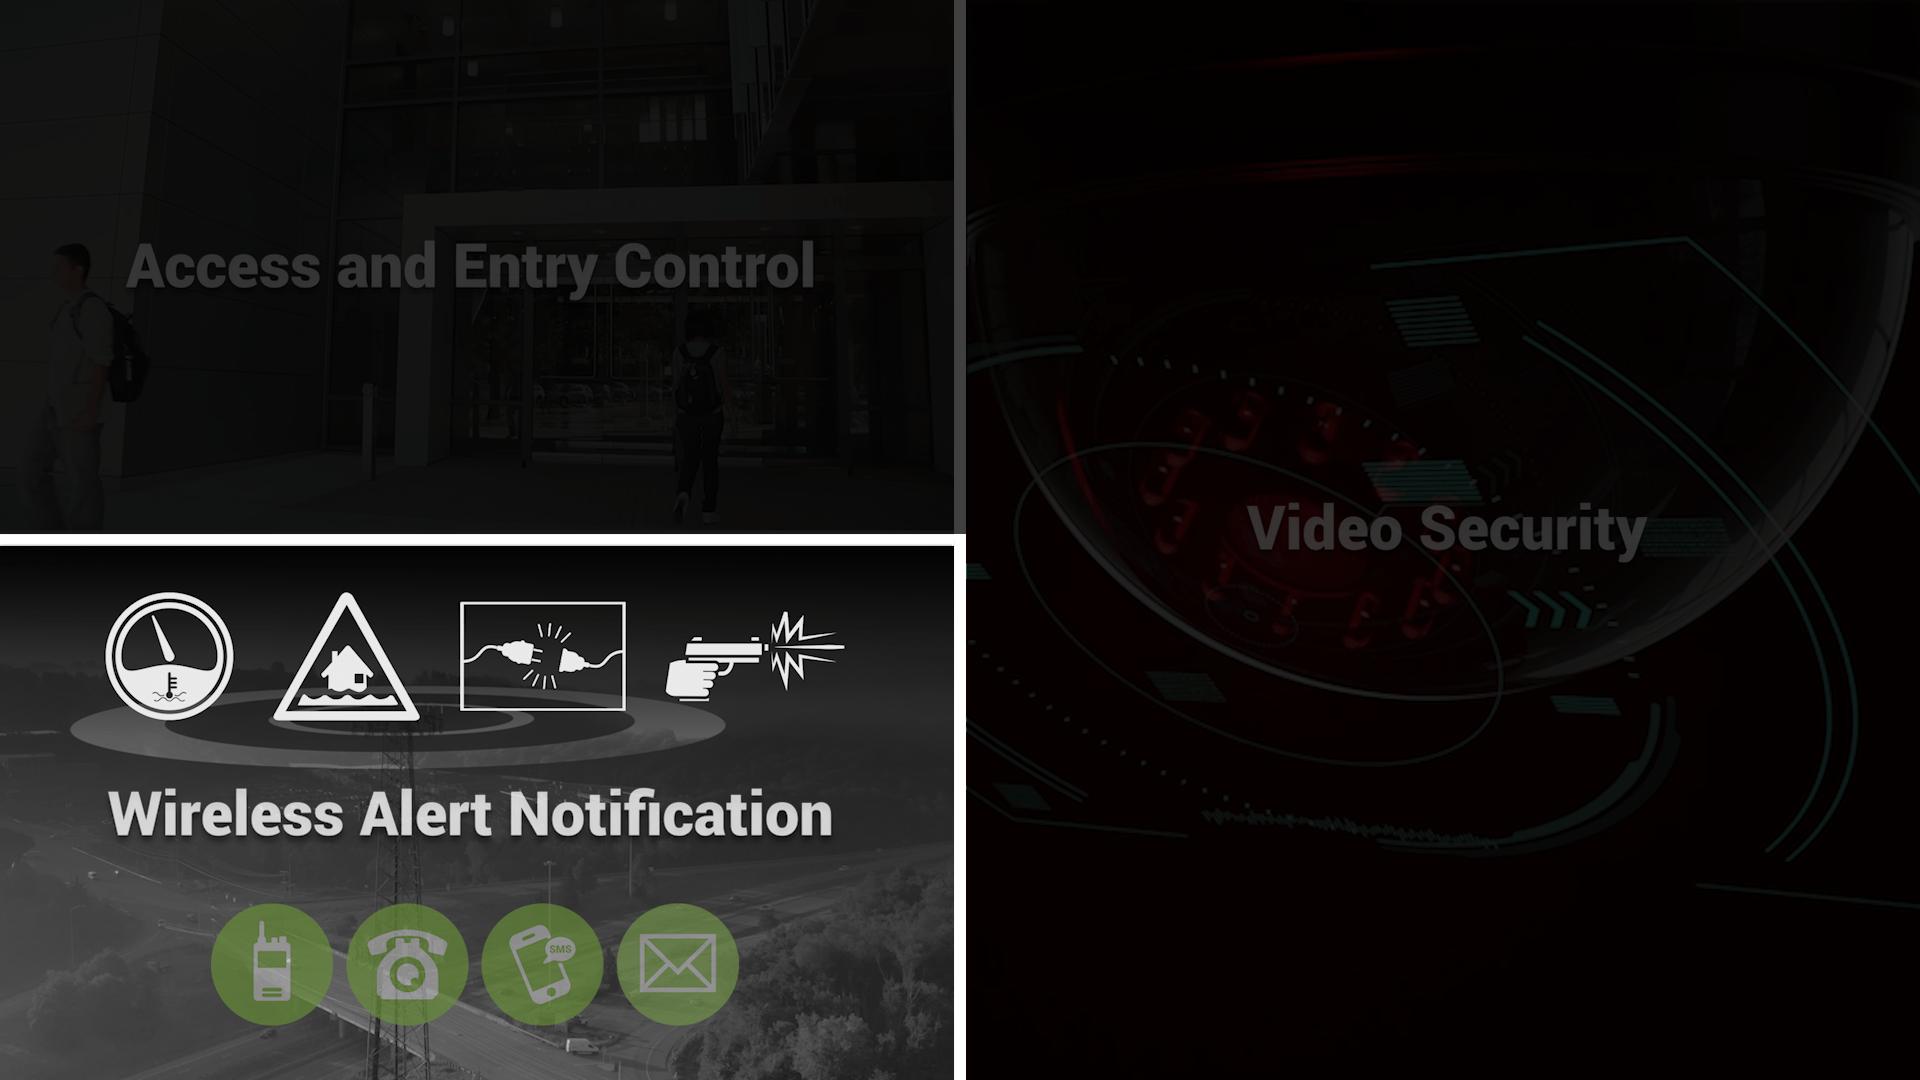 Wireless Alert Notification